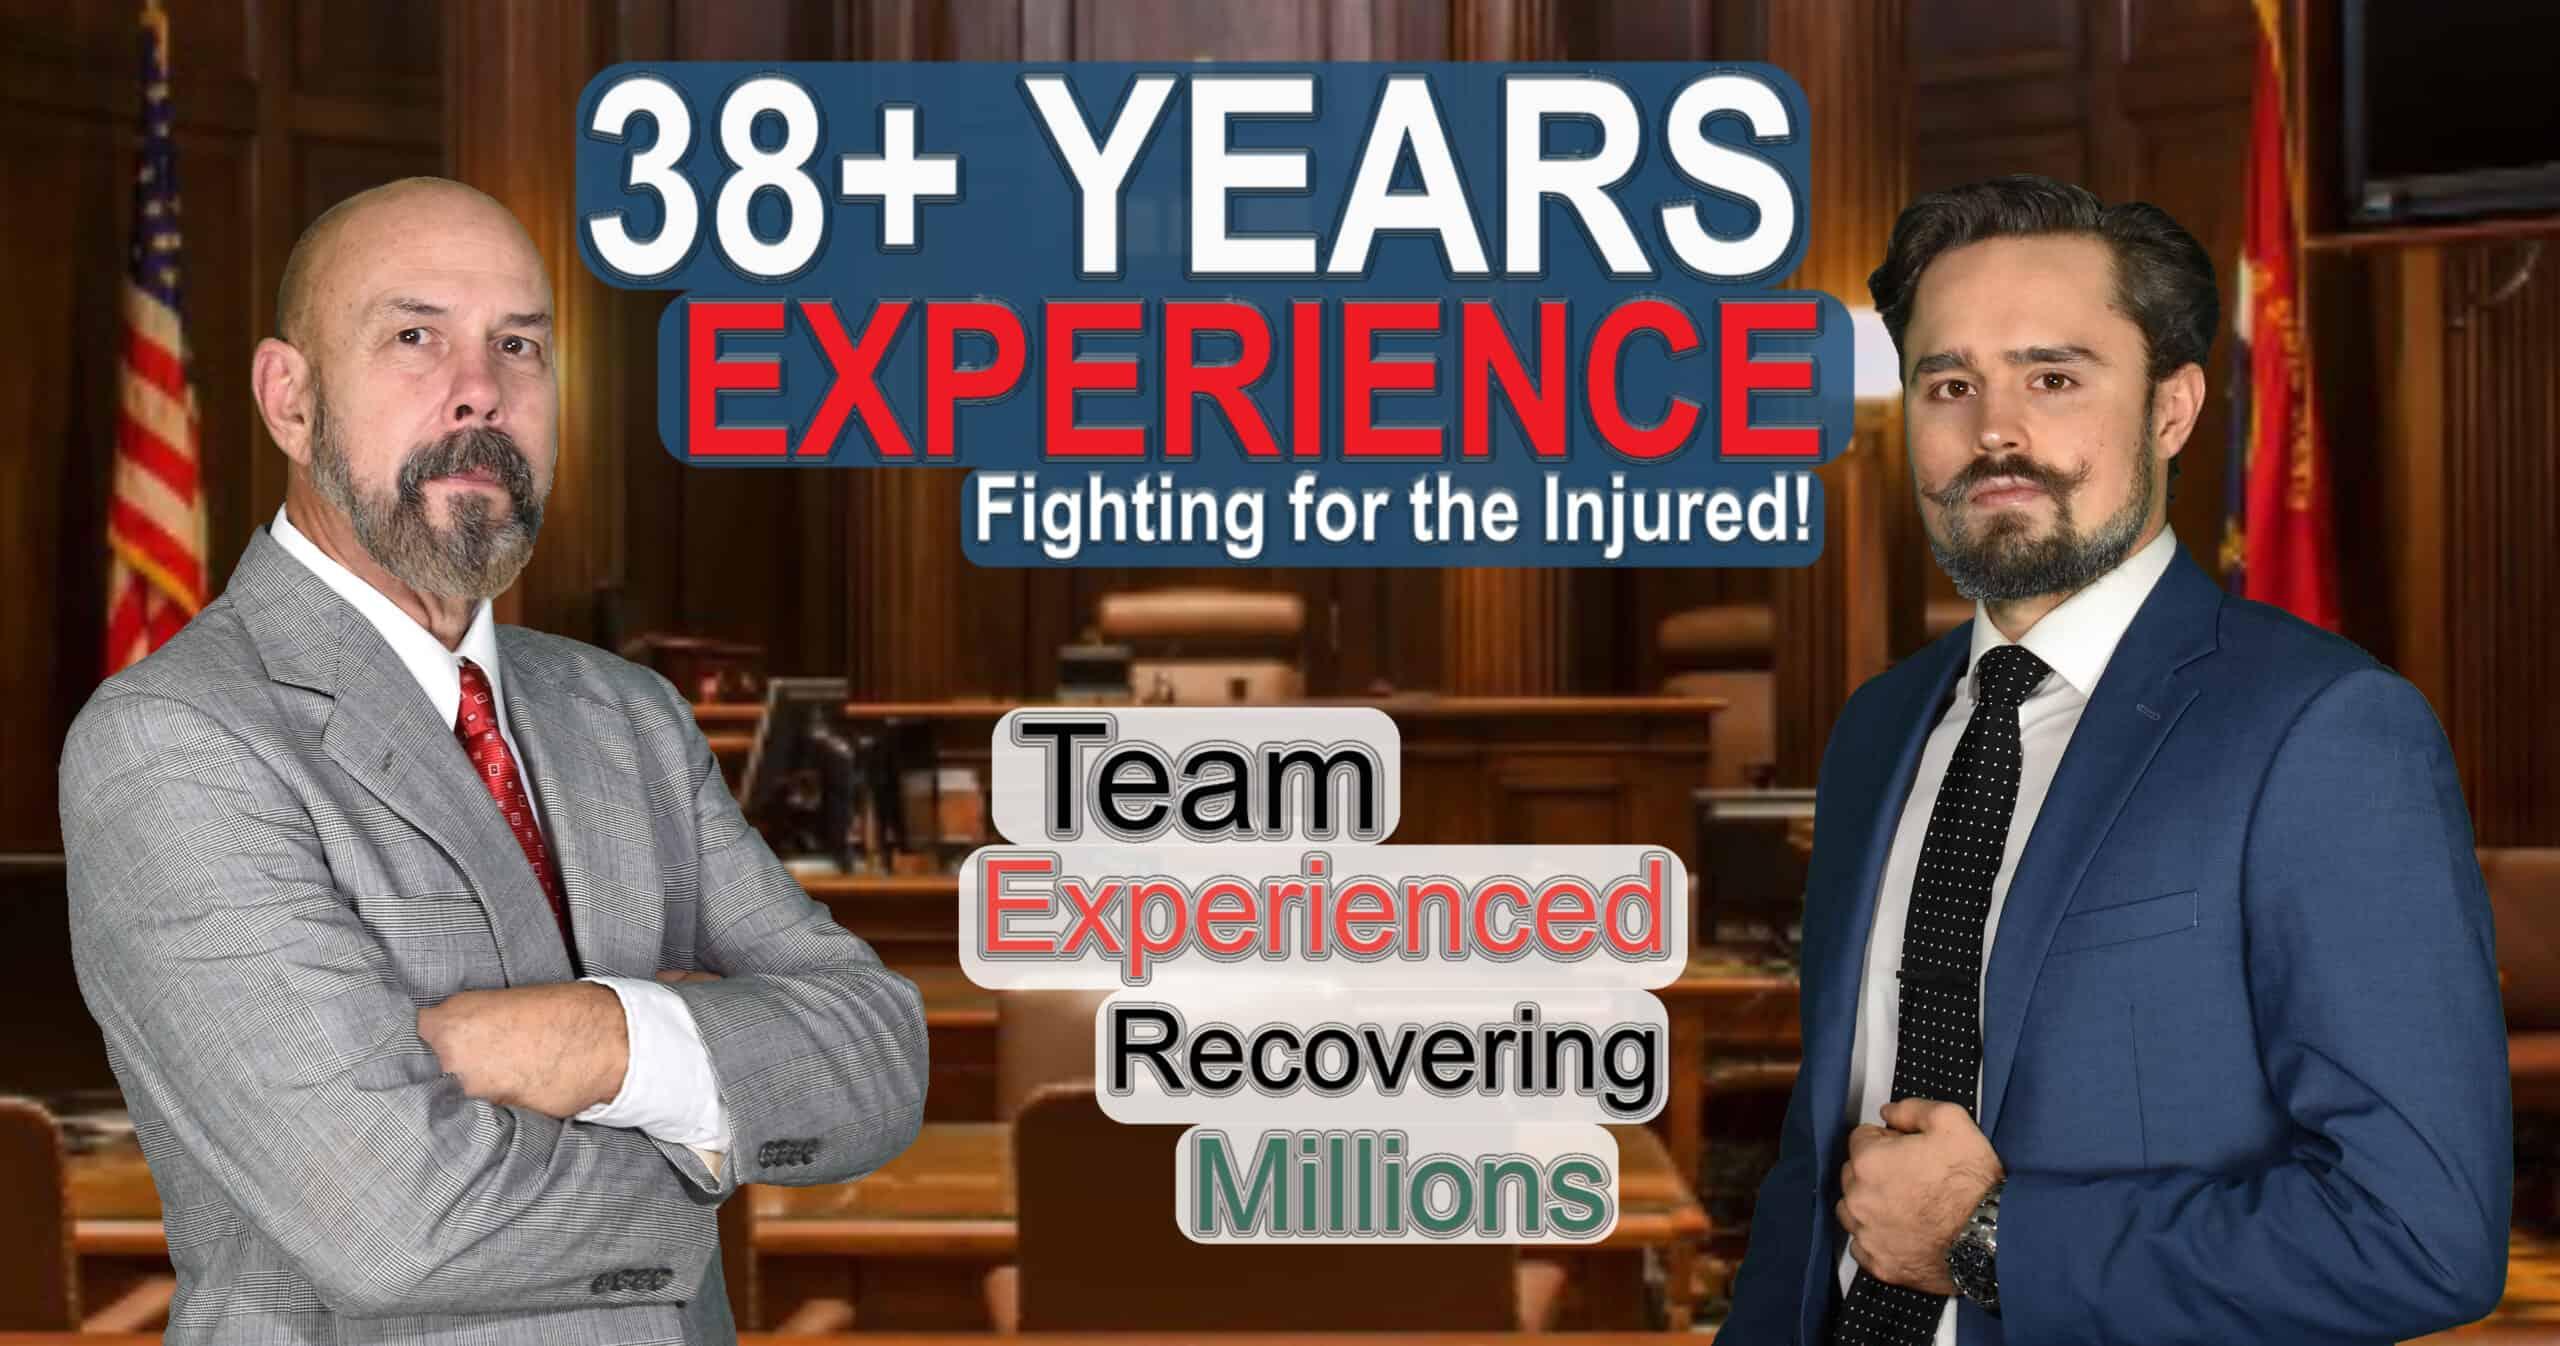 Decatur-Georgia-Personal-Injury-Attorney-Lawyer-Hurt-Injured-Damages-Hospital-Car-Accident-Broken-Best-Merck-Law